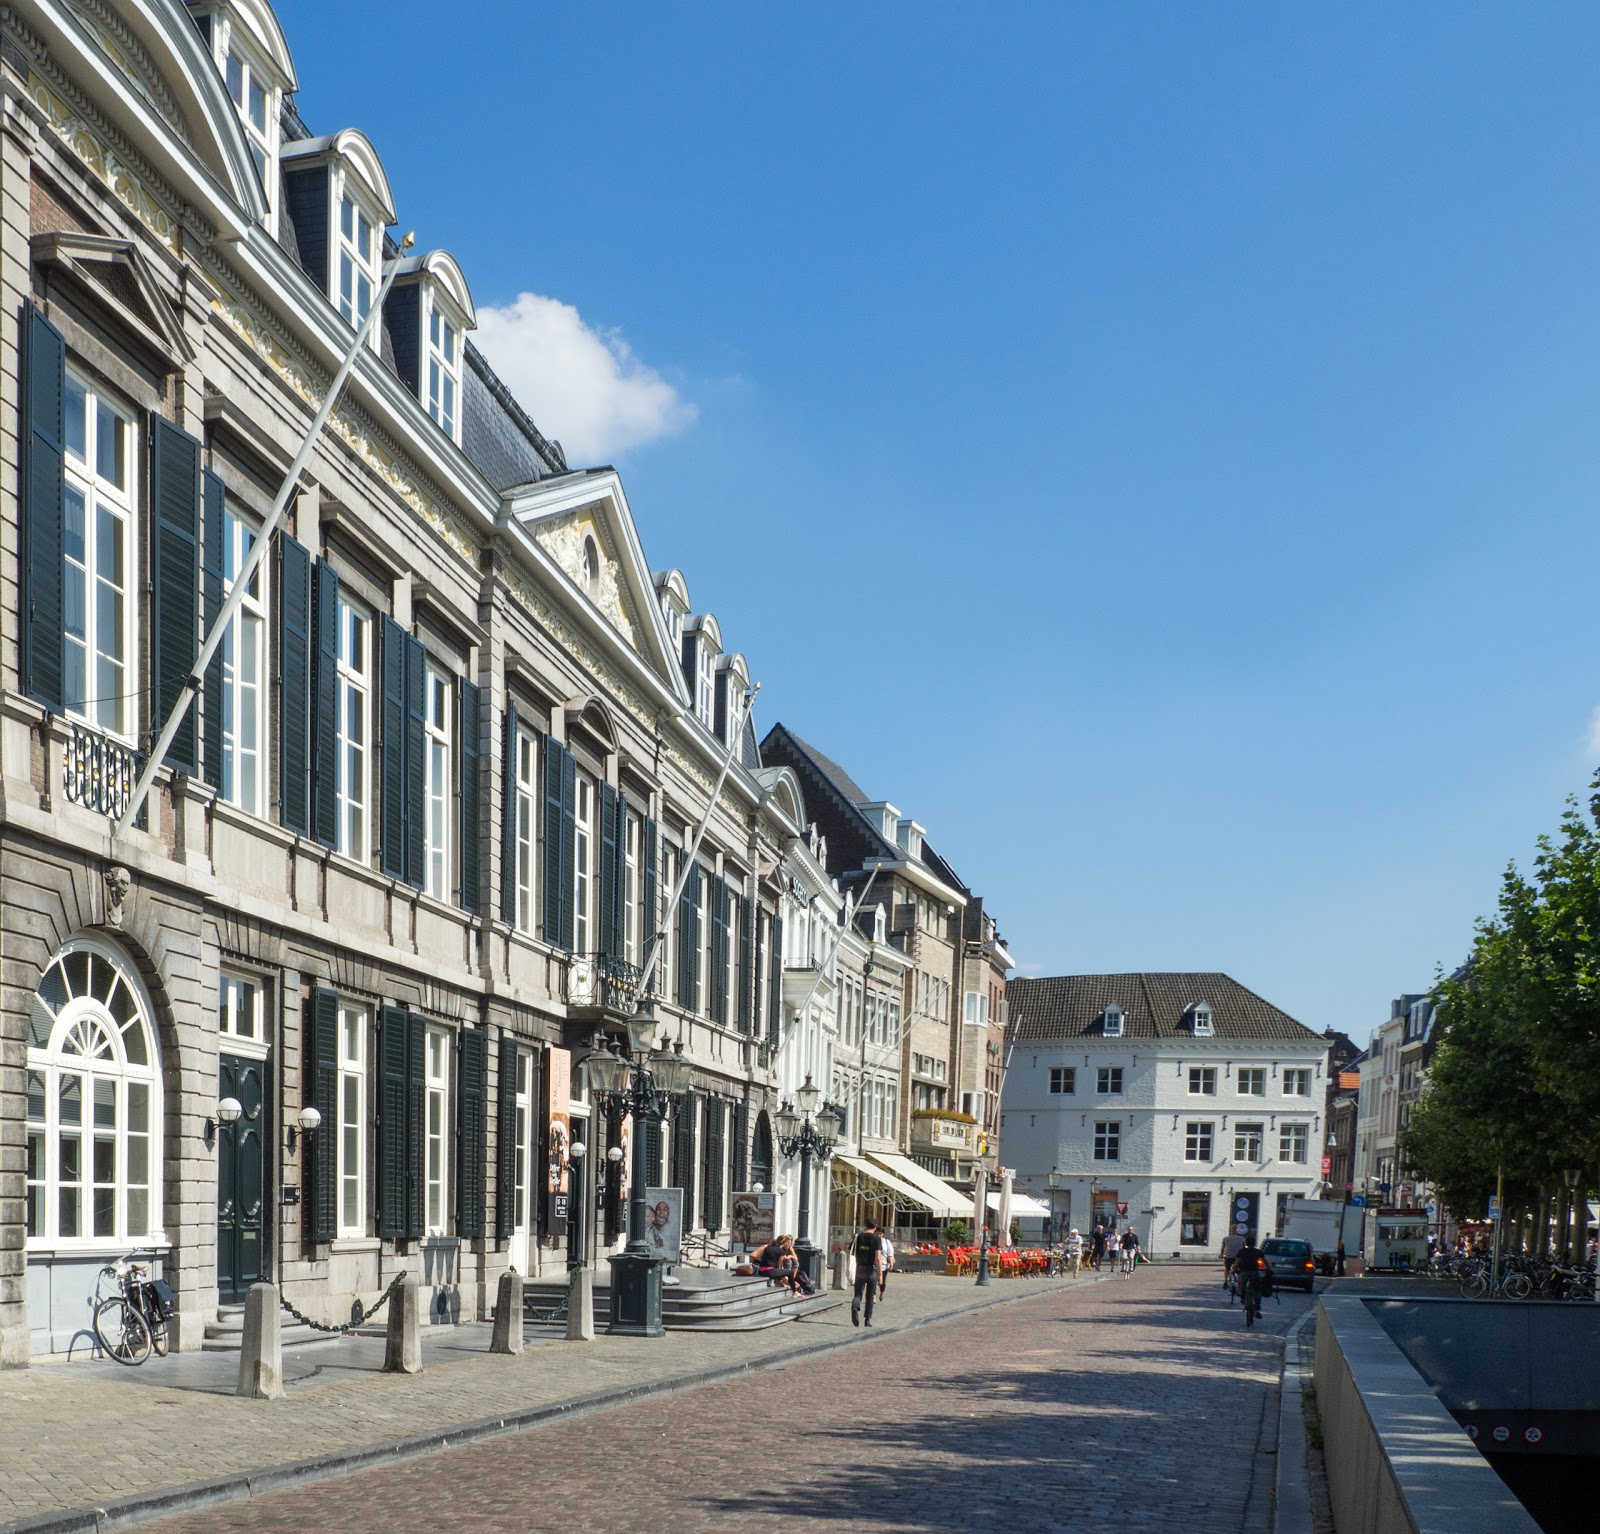 Theater-Aan-'t-Vrijthof-Nederland-accepteert-American-Express-Credit-Cards